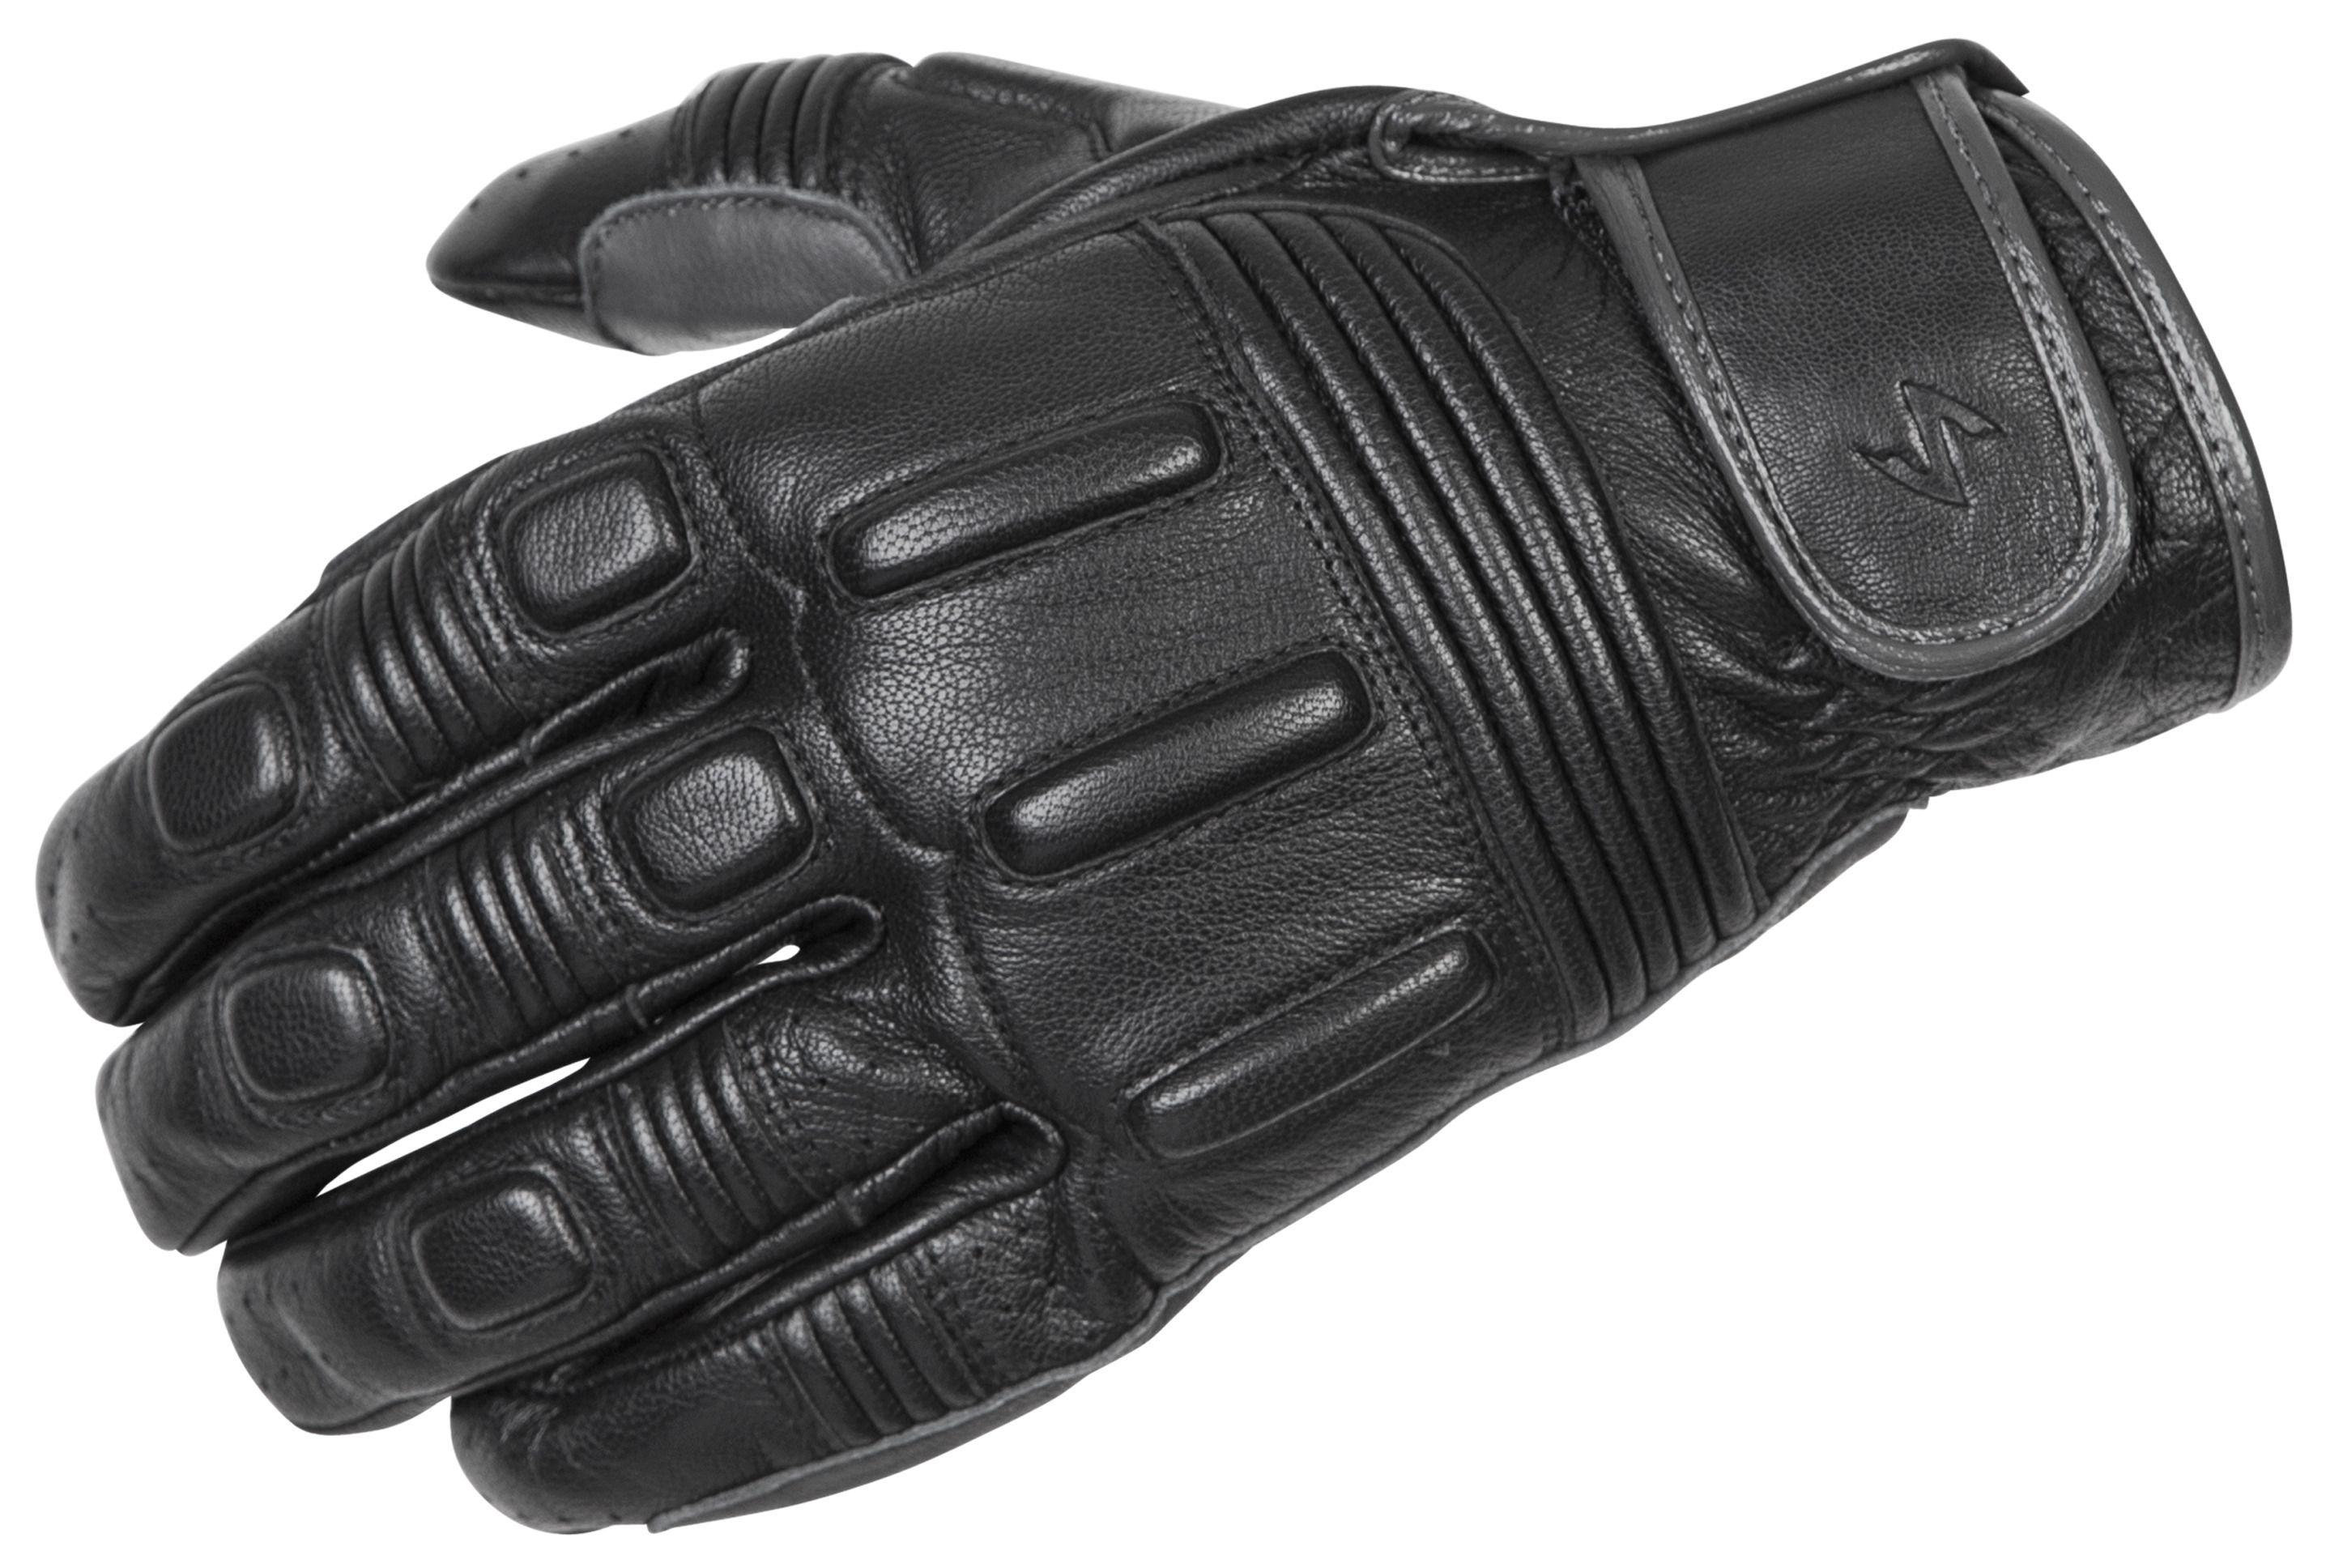 Xxl black leather gloves - Xxl Black Leather Gloves 48